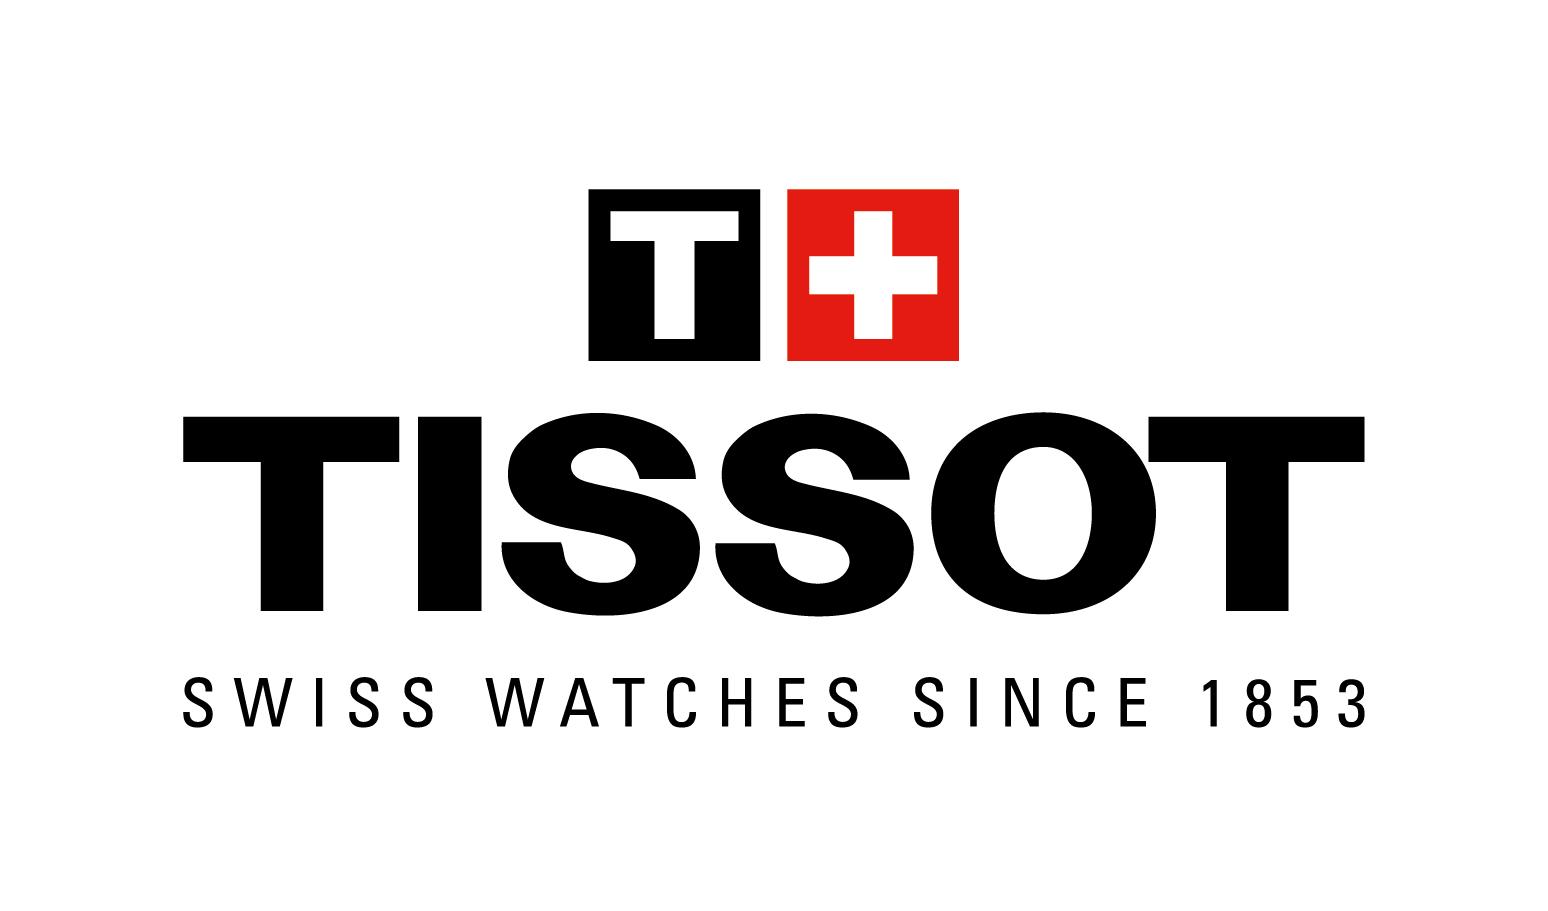 https://secureservercdn.net/45.40.146.38/d7i.3e2.myftpupload.com/wp-content/uploads/2020/10/Tissot_Logo_Official_rgb.jpg